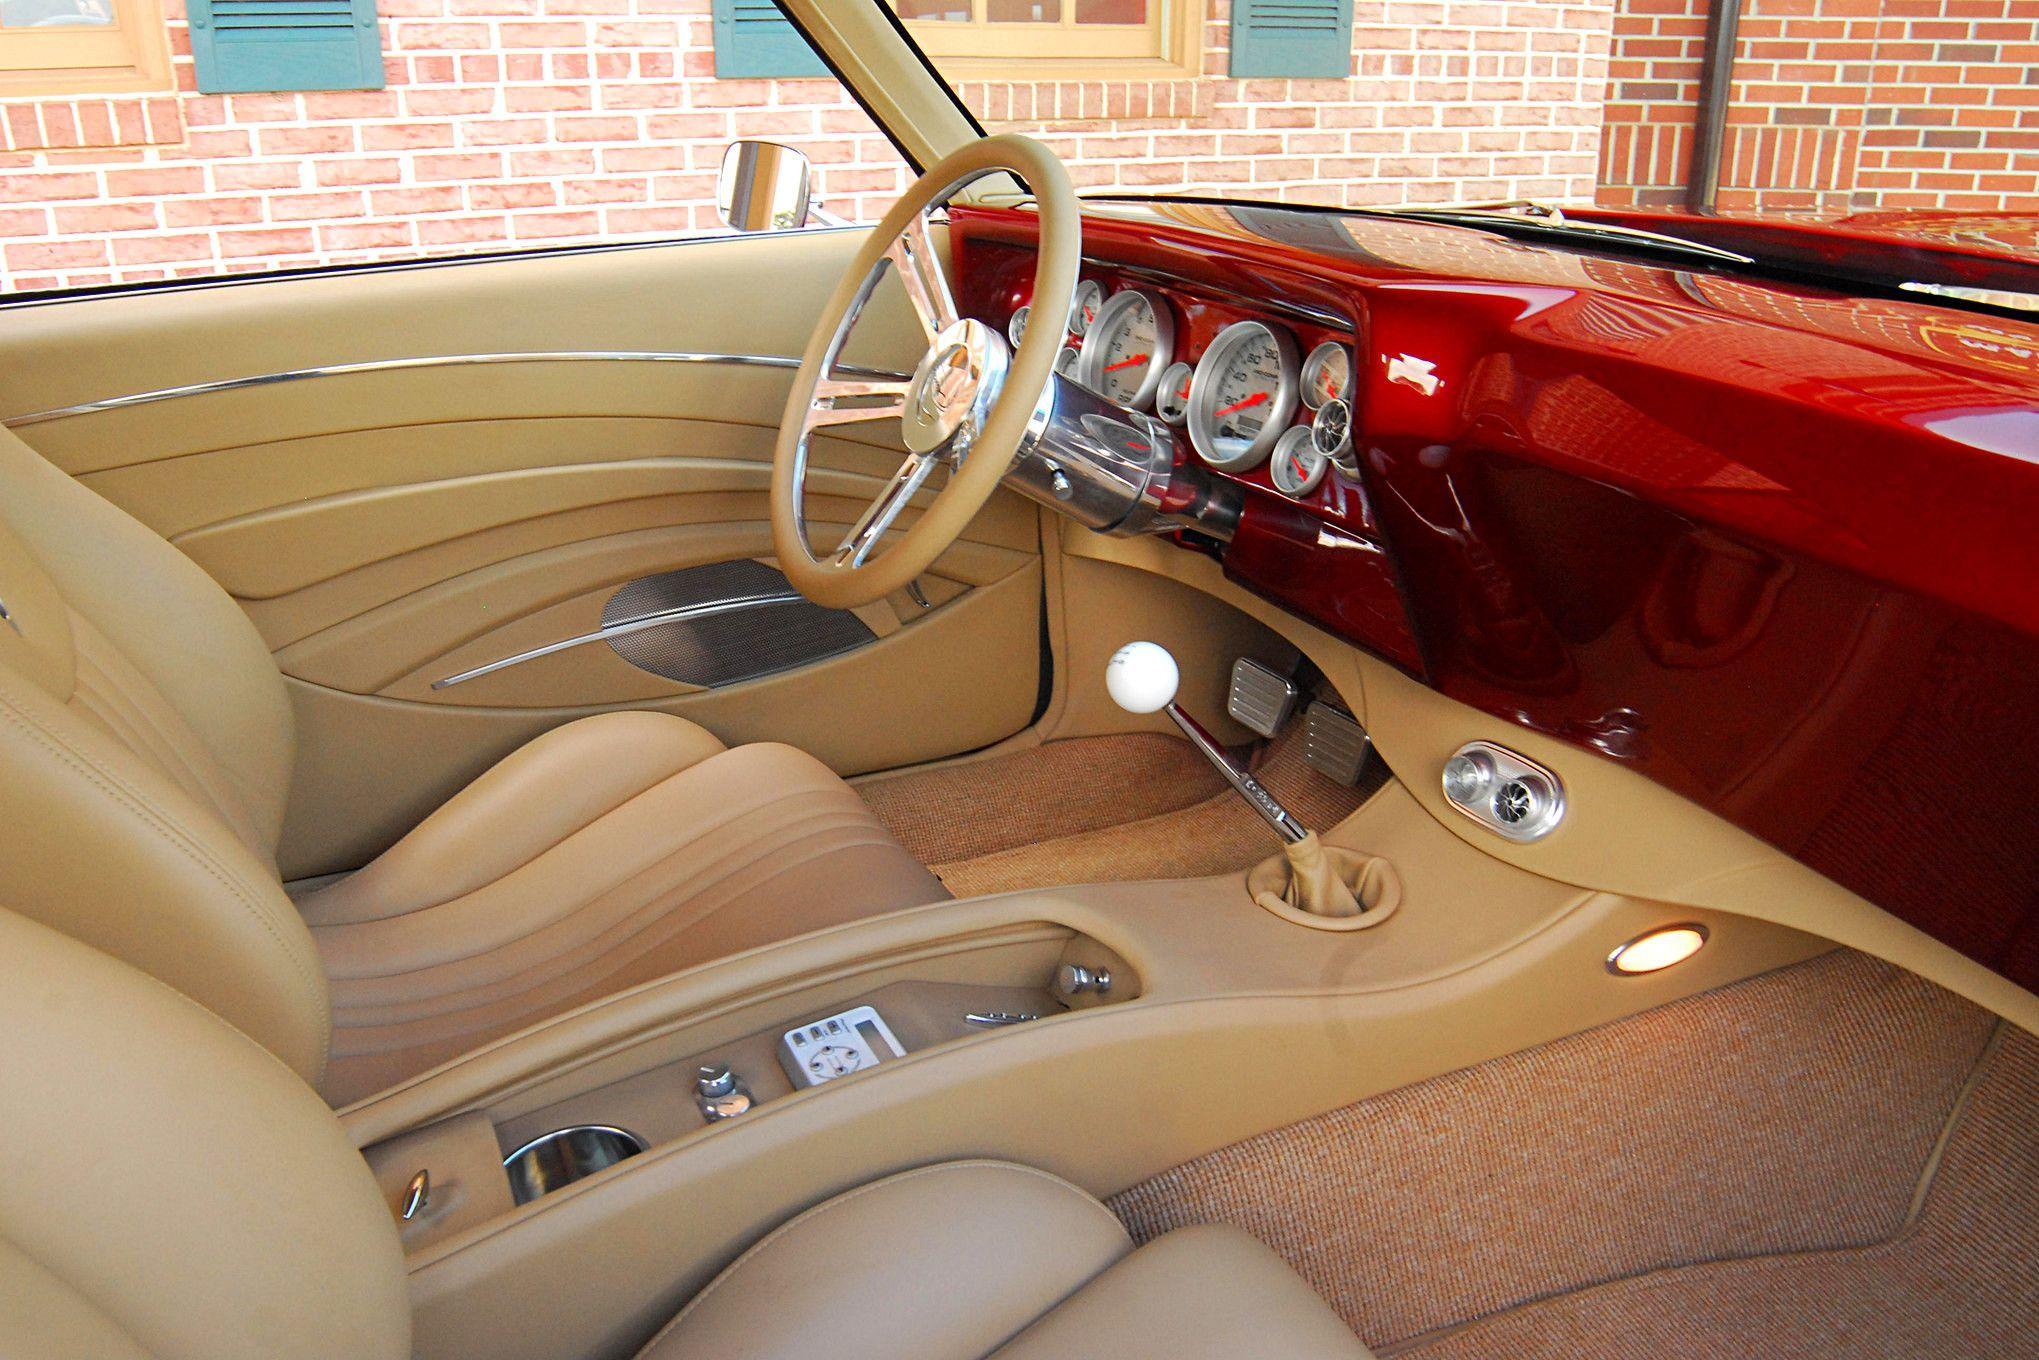 1969-copper-camaro-custom-red-008.jpg (2039×1360)